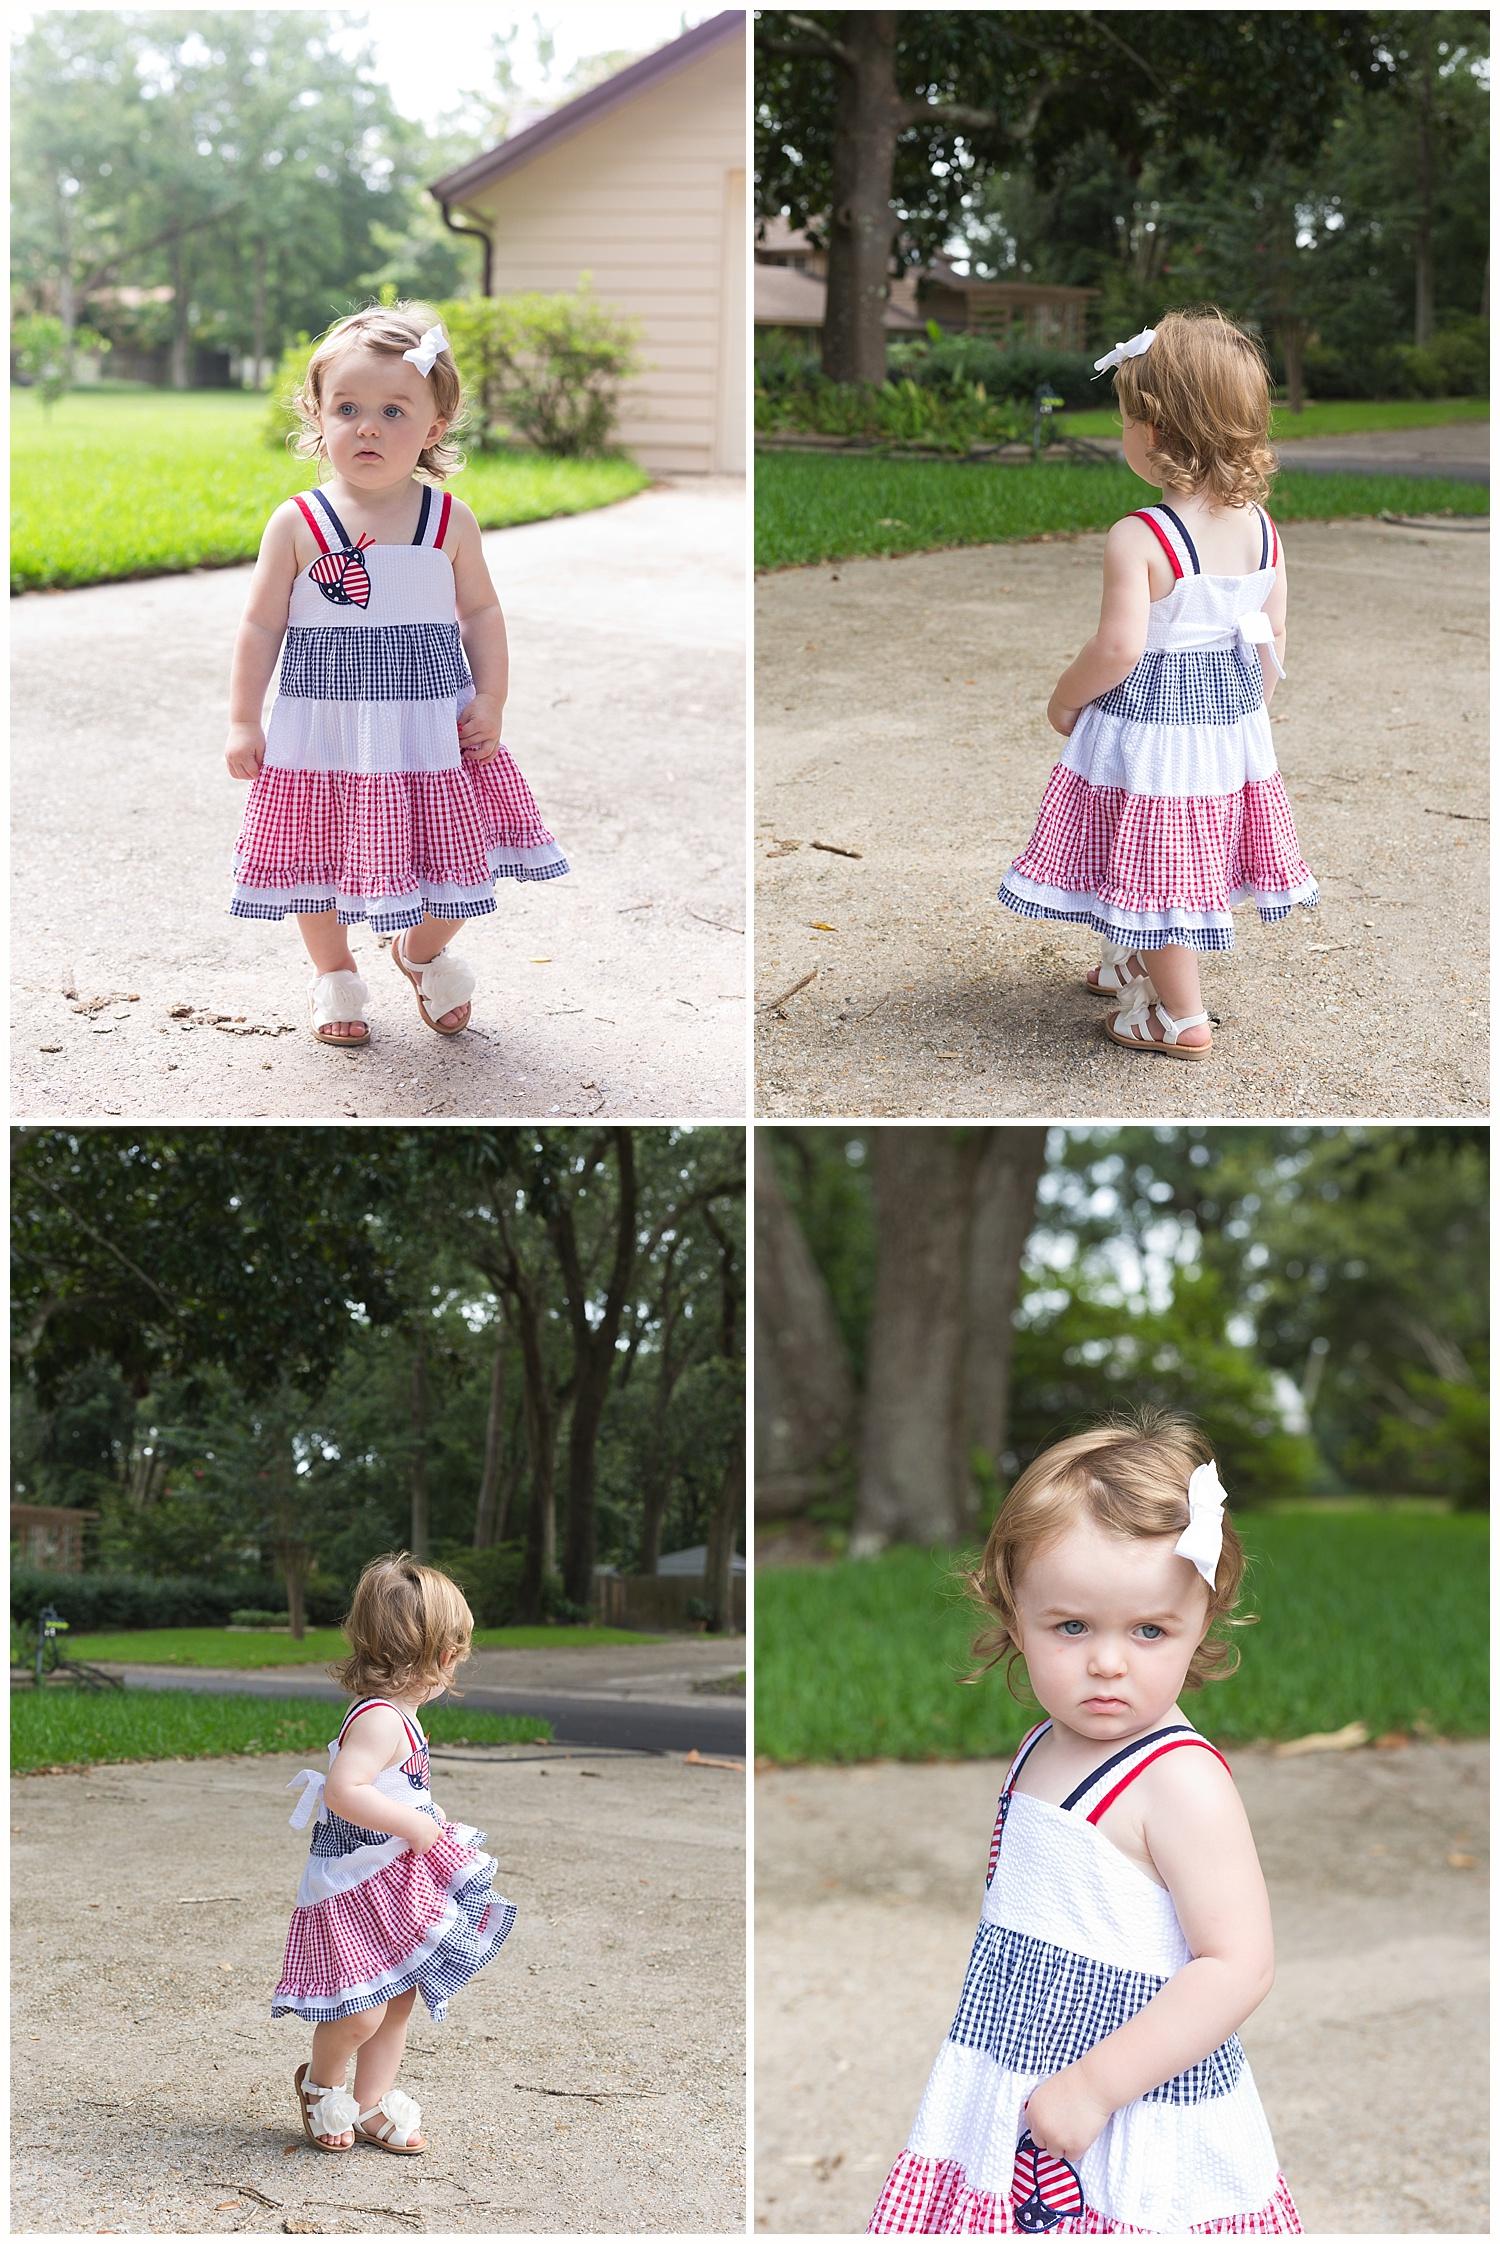 2-year-old girl in patriotic dress